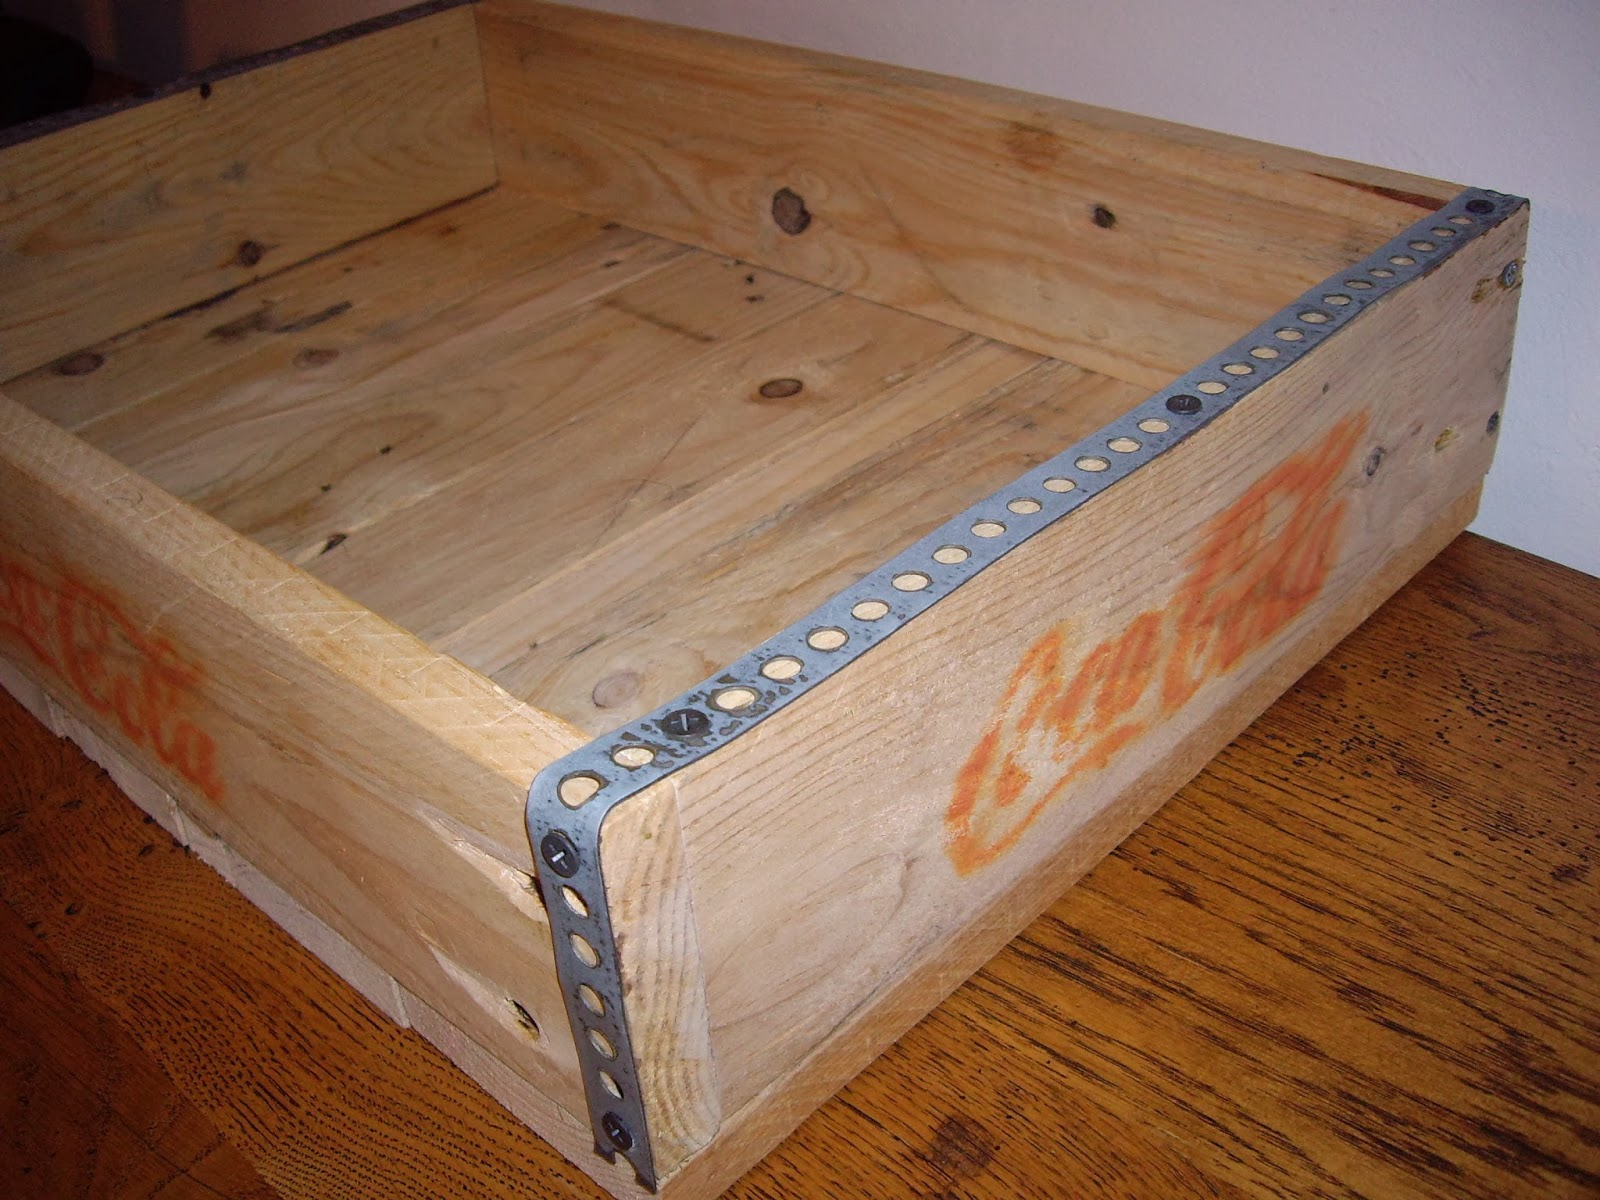 objets d co tutoriels et meubles en bois de palettes f vrier 2014. Black Bedroom Furniture Sets. Home Design Ideas